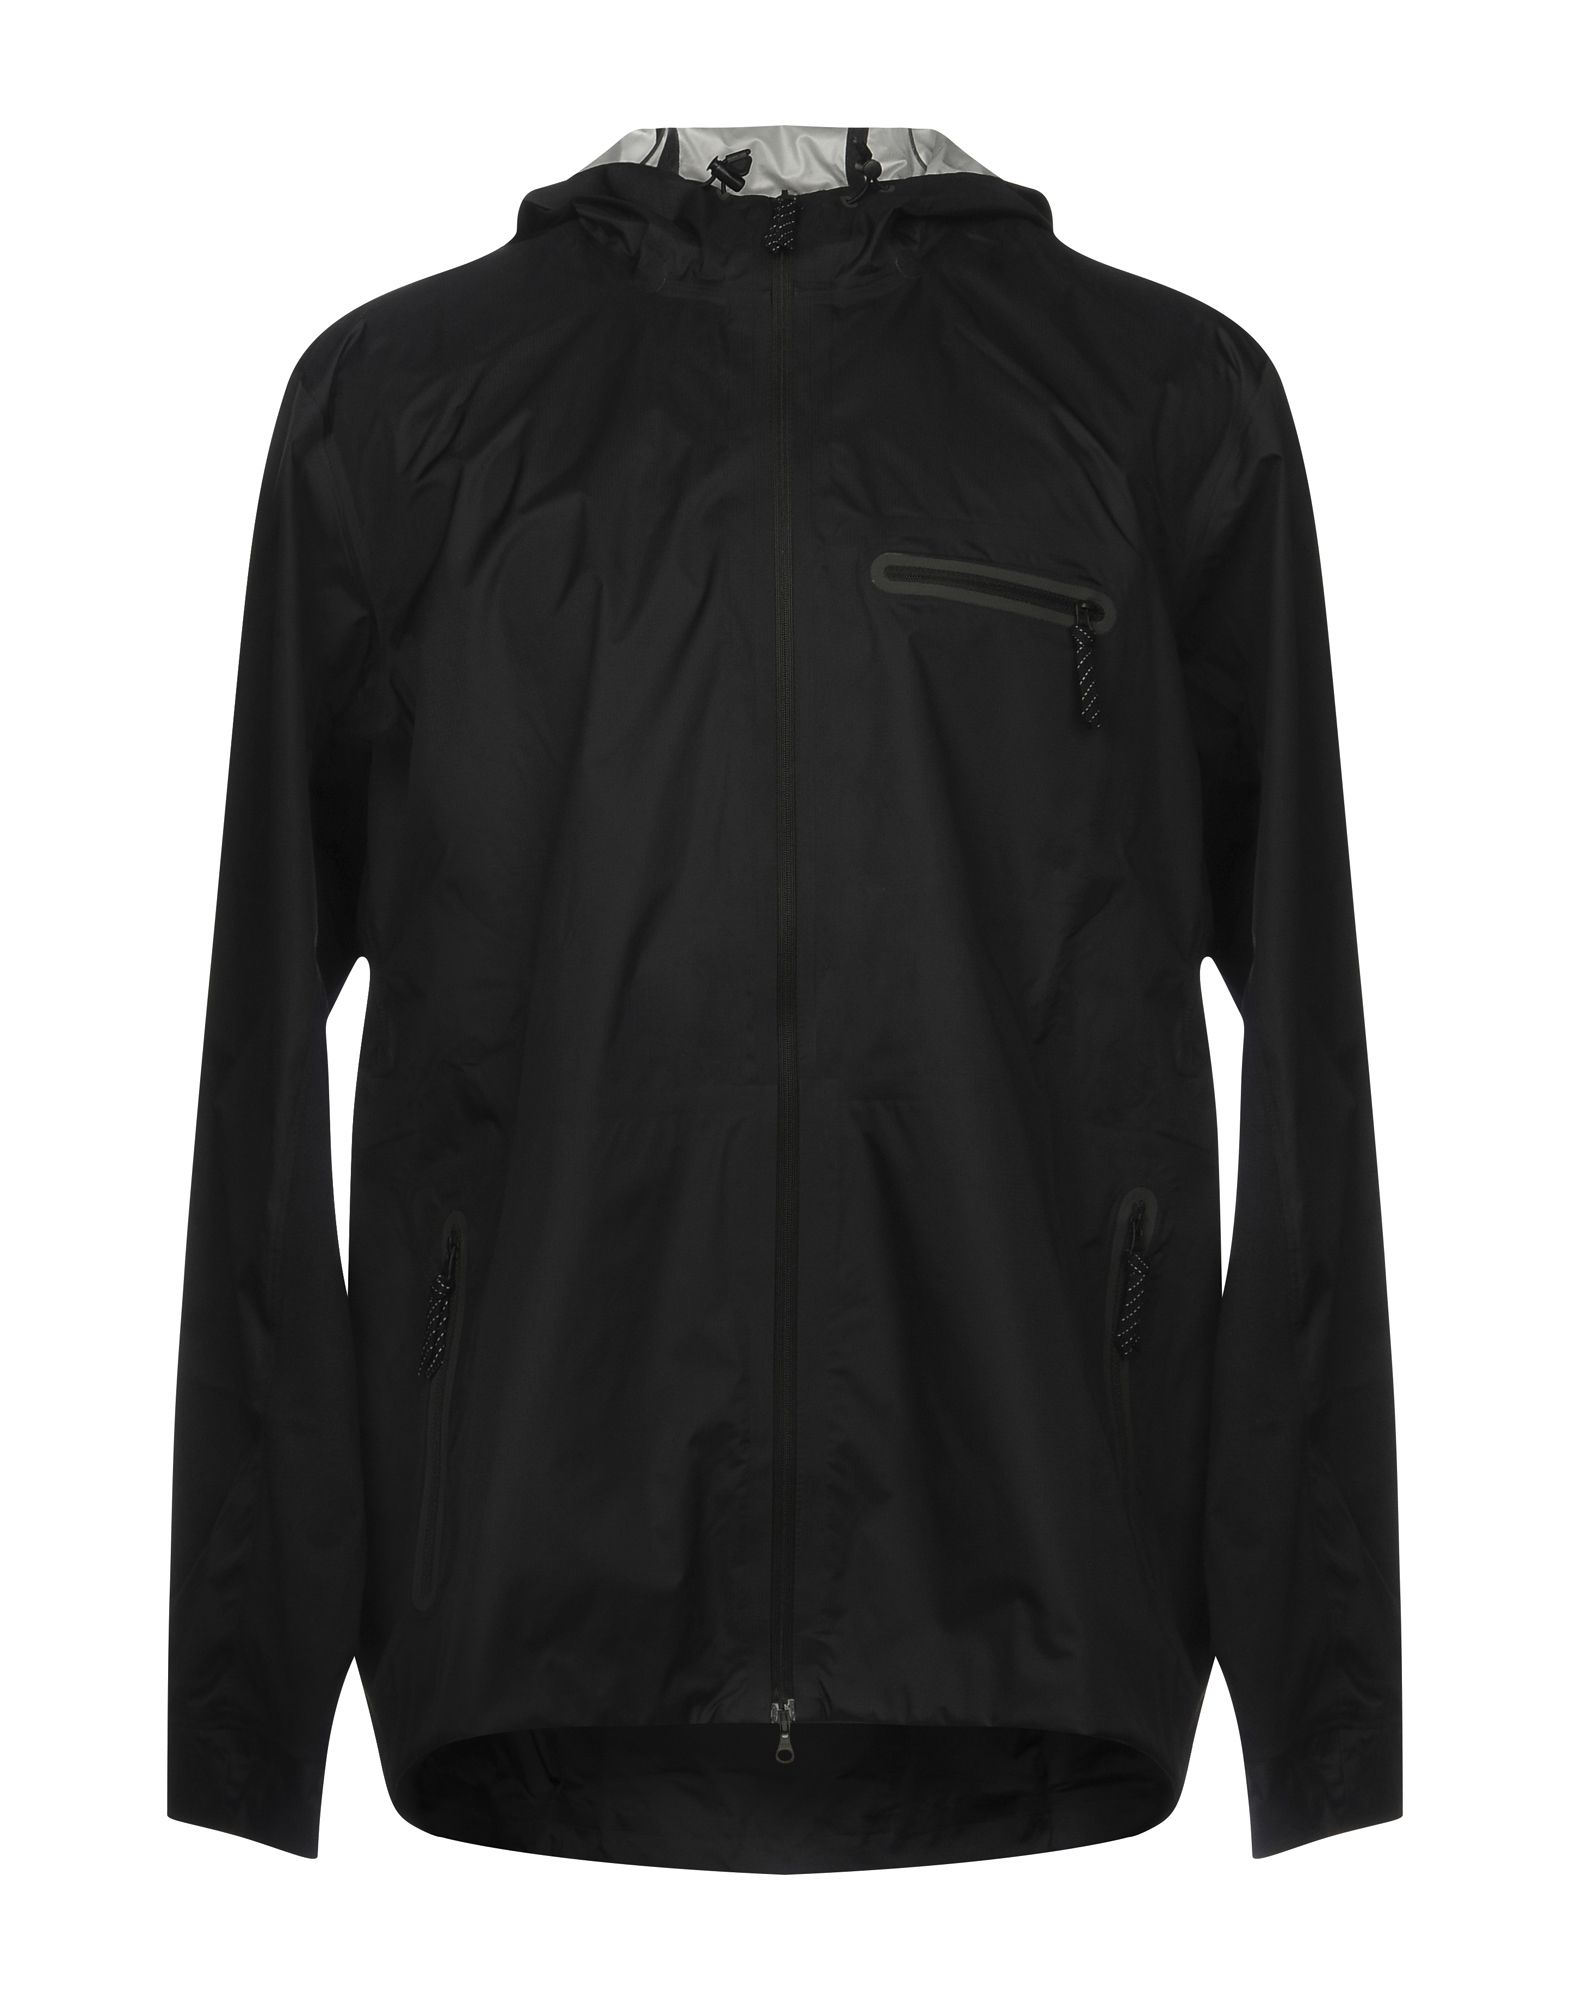 Giubbotto Nike Sb Collection Uomo - Acquista online su